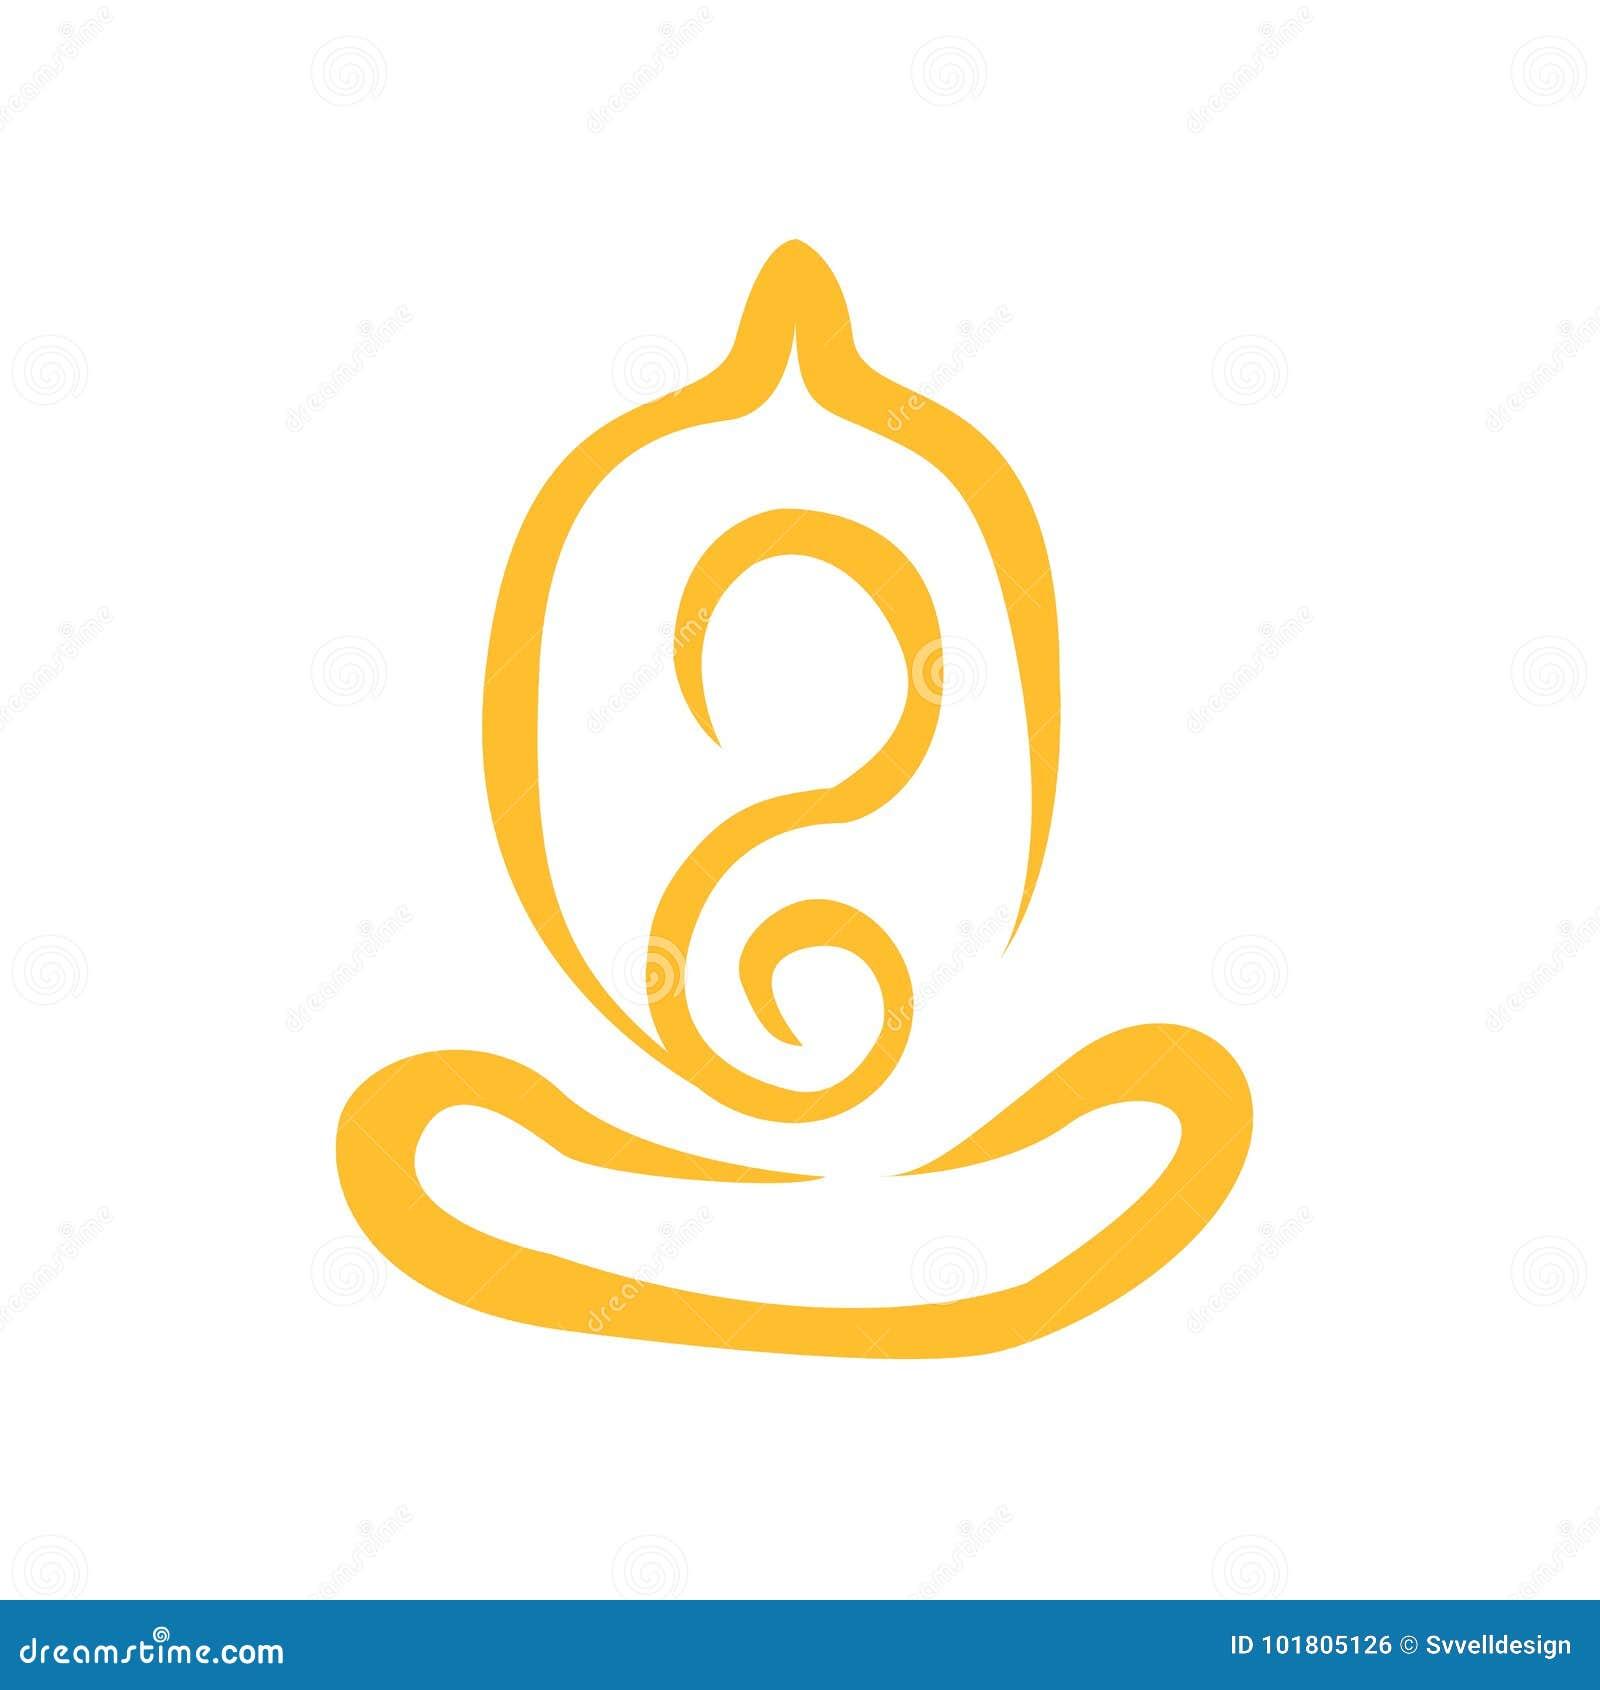 Creative Abstract Simple Line Art Yoga Meditation Stock